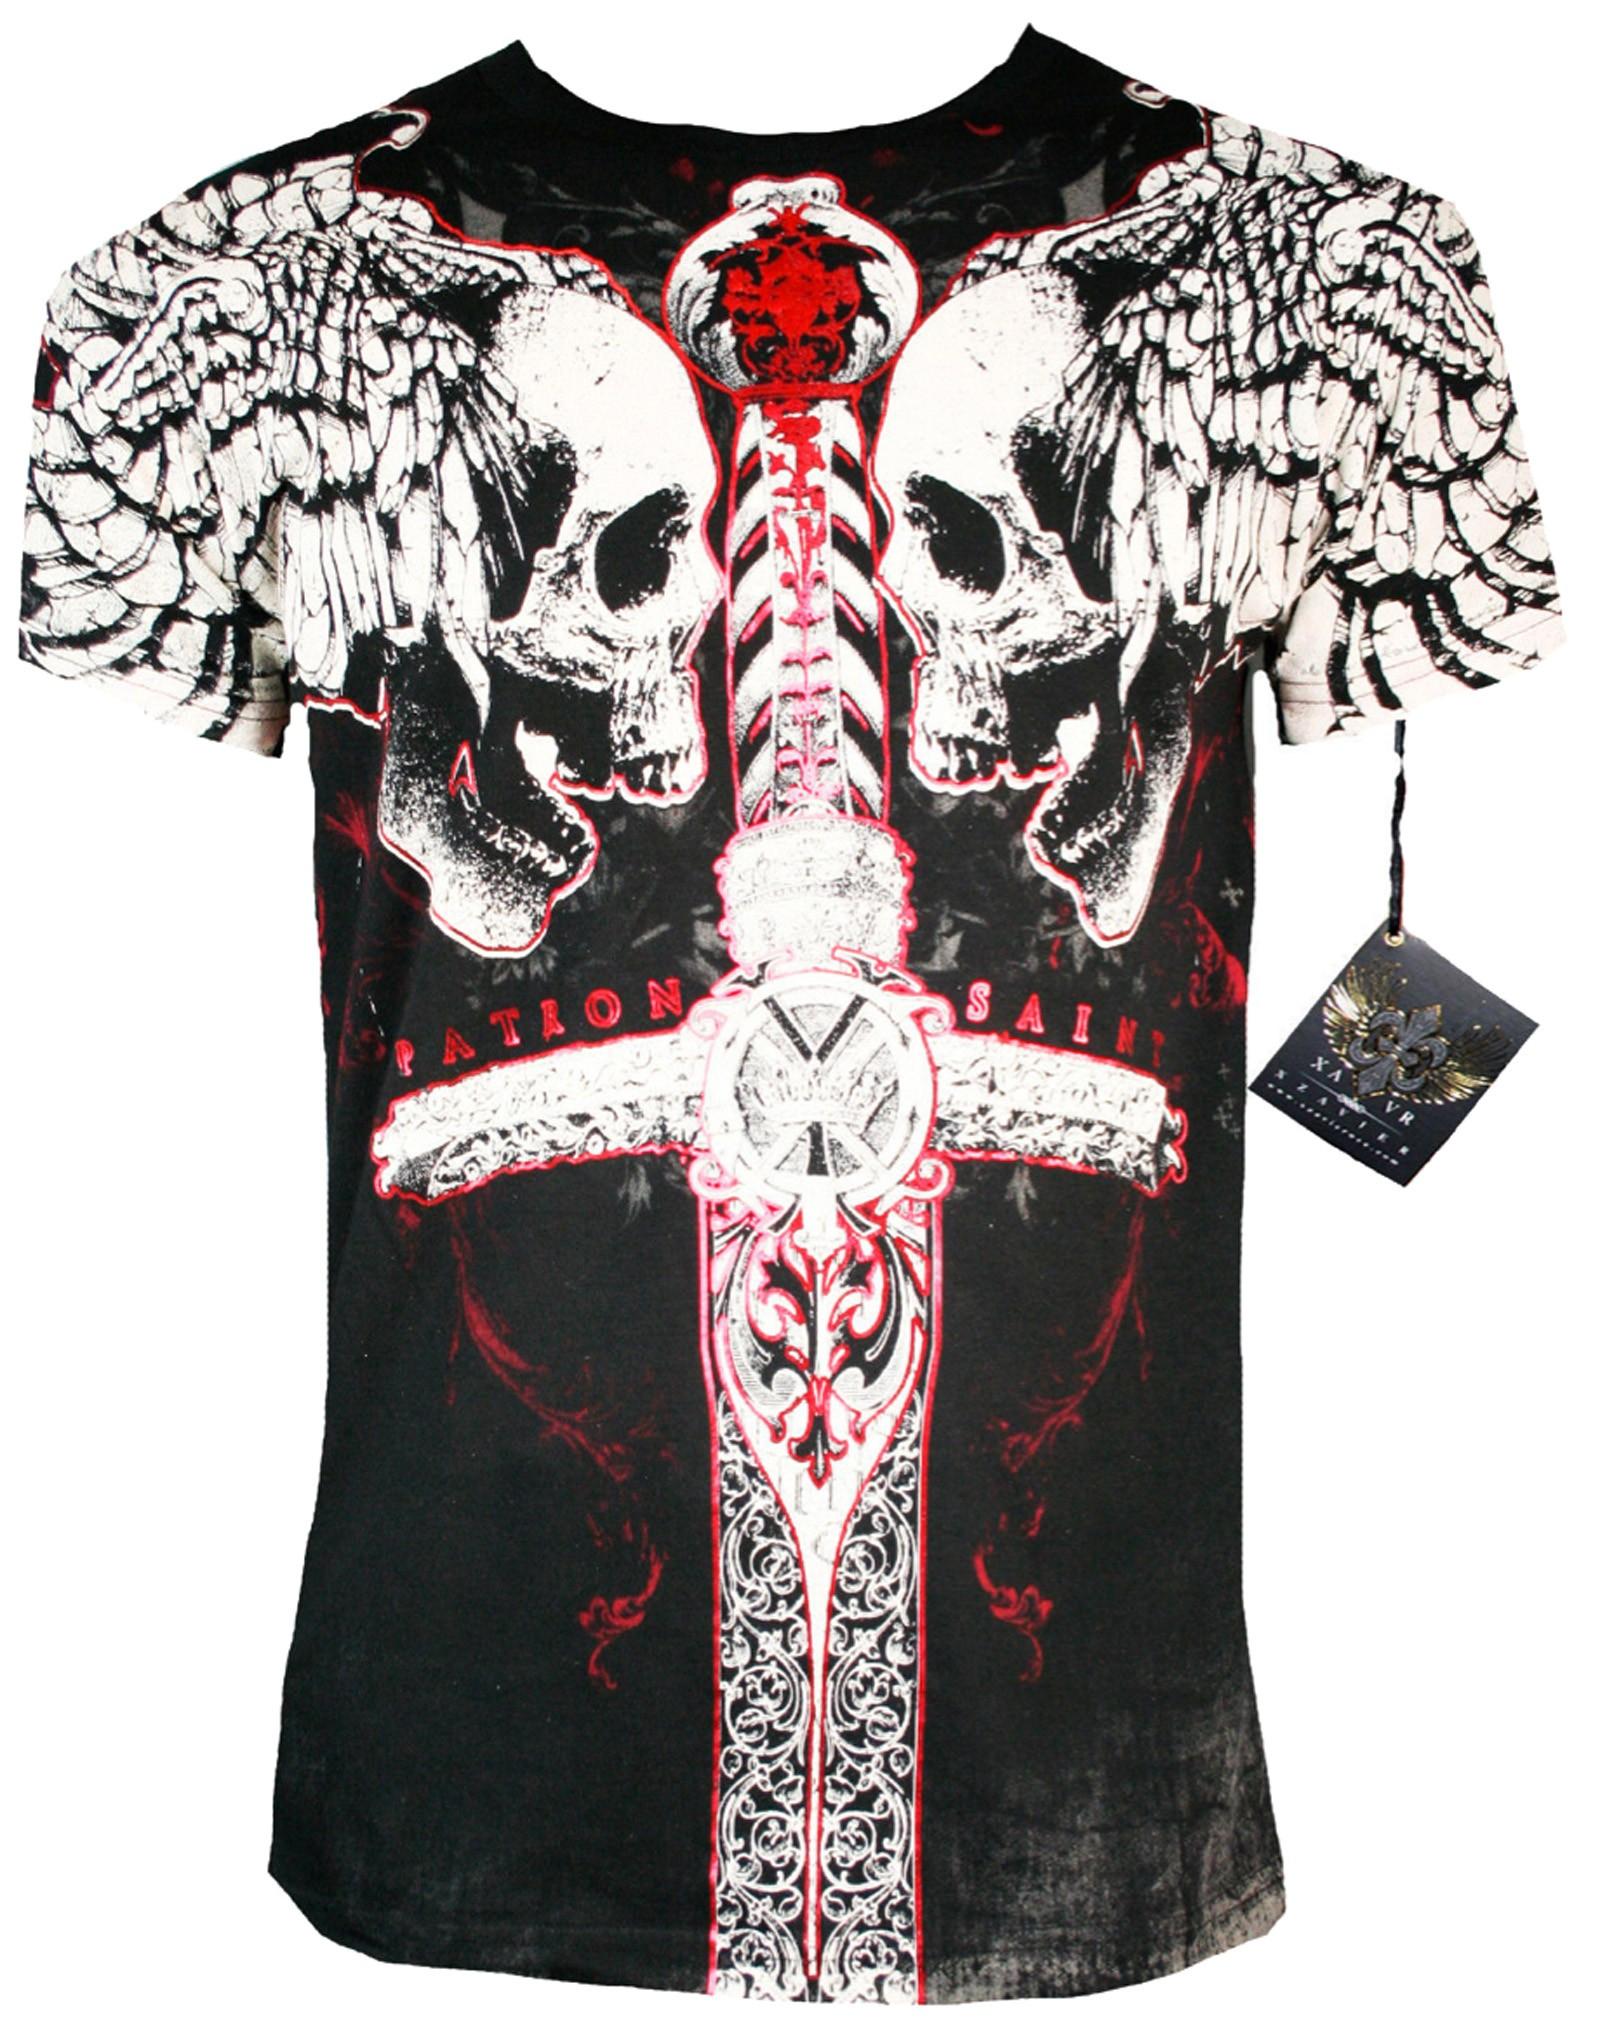 Xzavier - Saint Sword T-Shirt Front